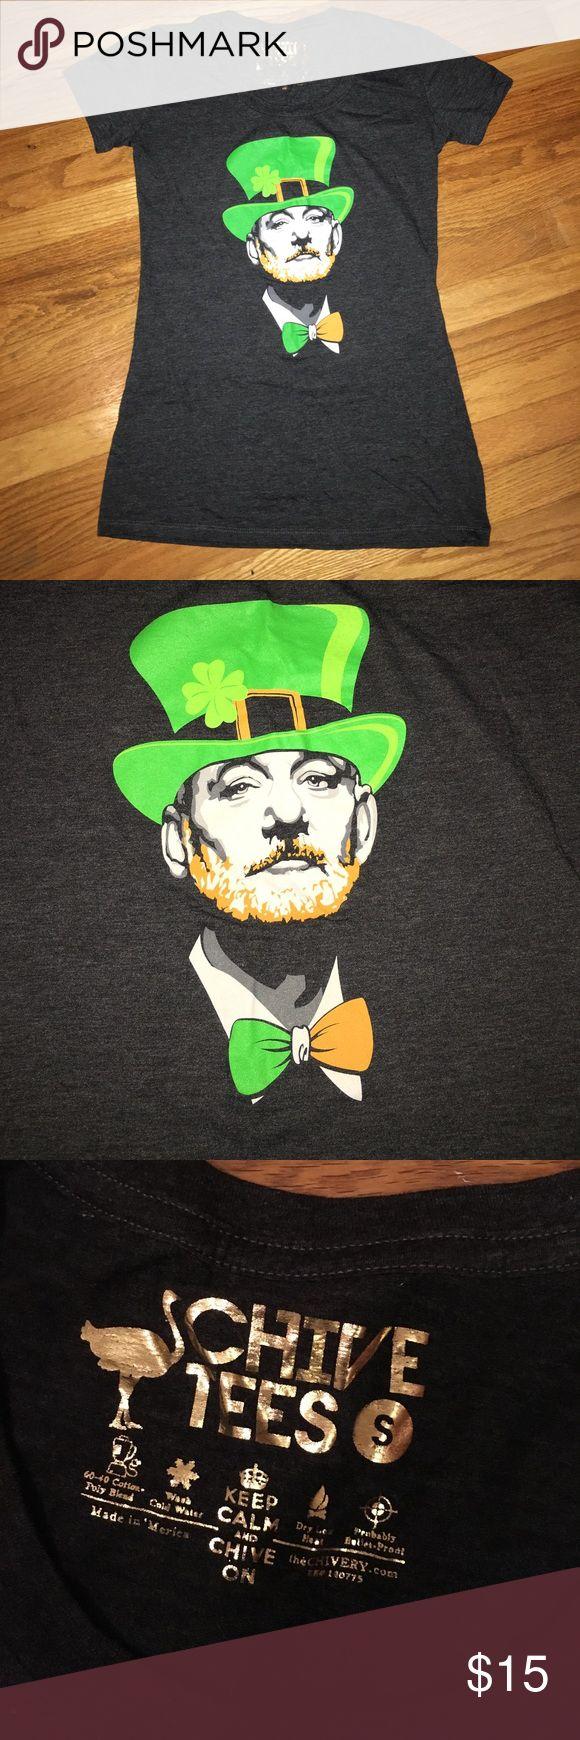 BFM Chive Shirt BFM St Pattys Day shirt 🍀🍀 The Chive Tops Tees - Short Sleeve